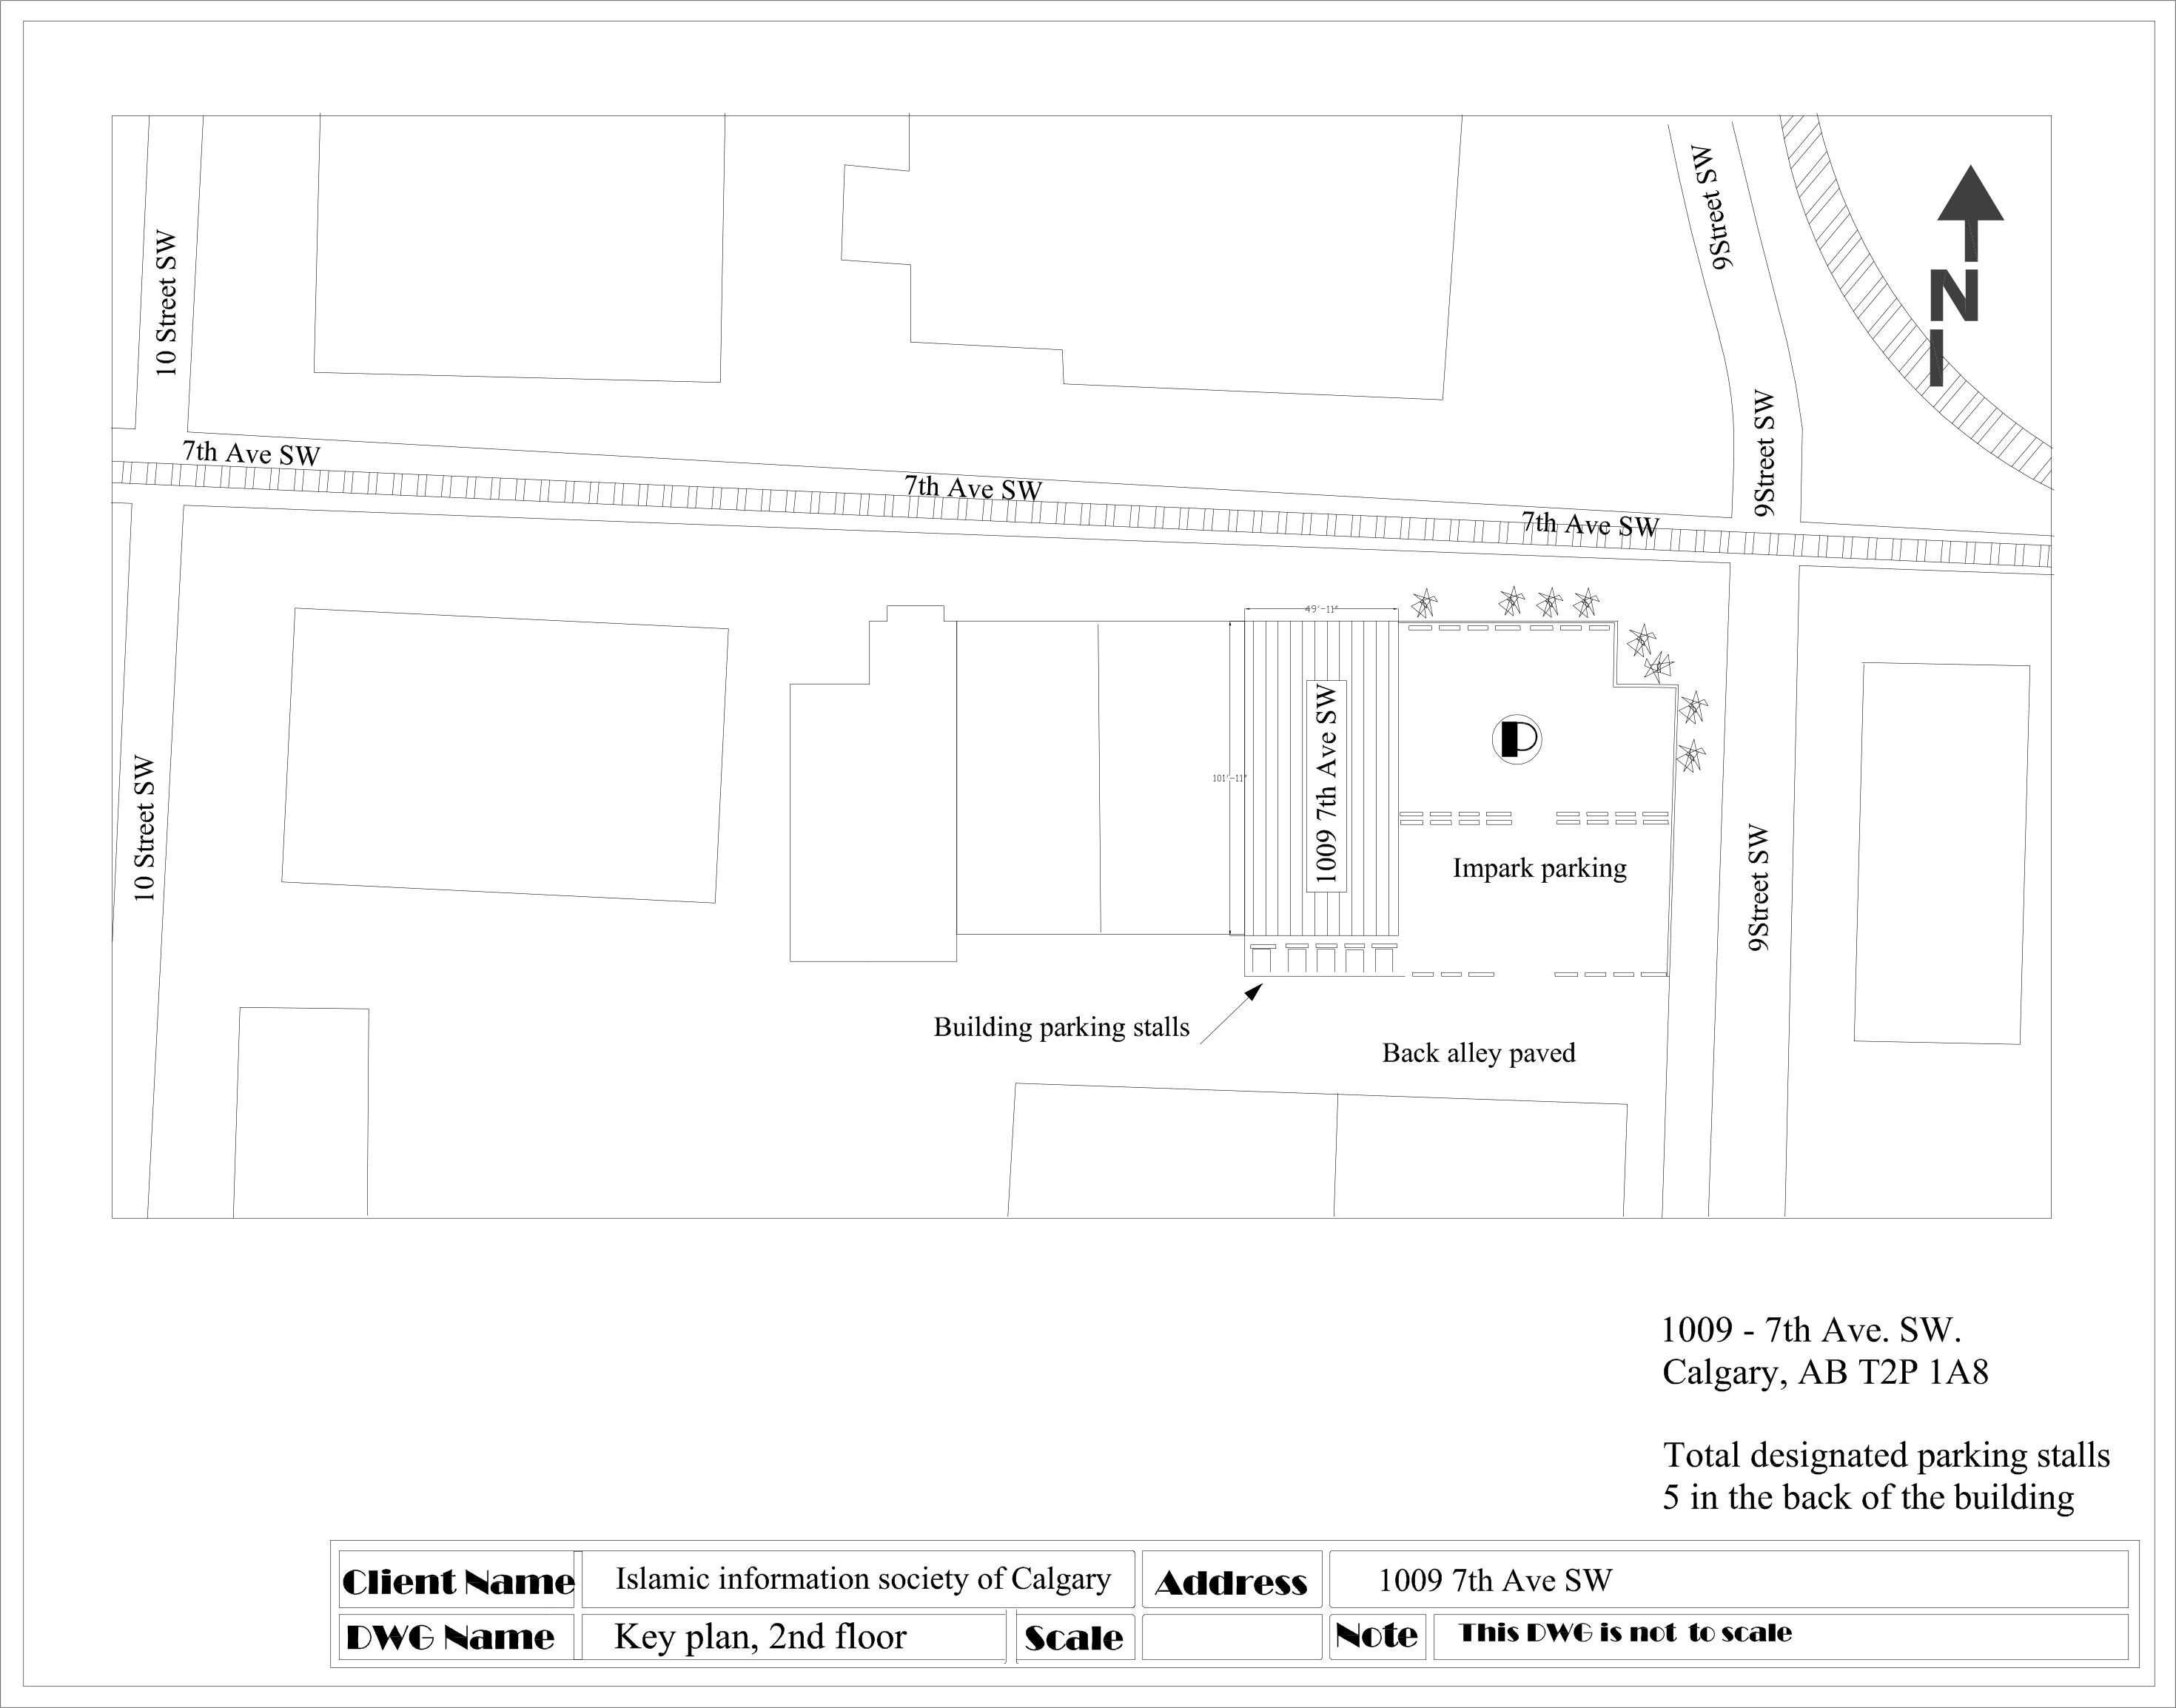 Key plan 1009 7th Ave SW